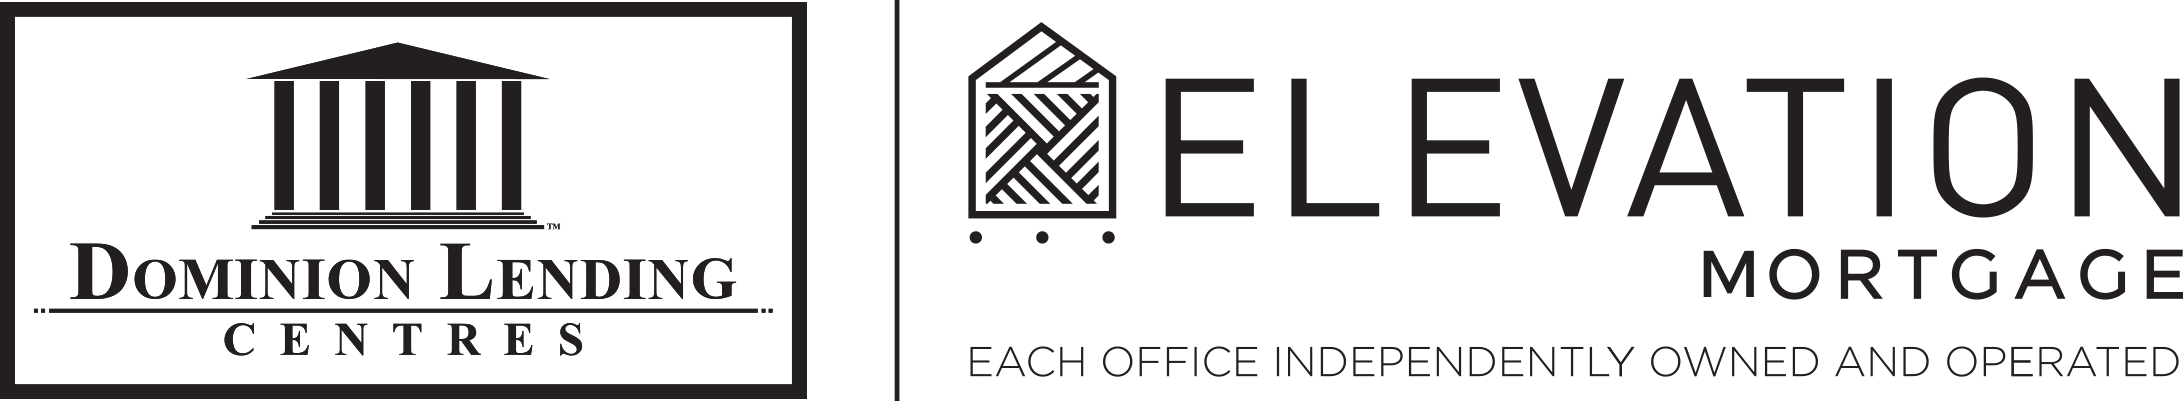 DLC NEW elevation logo-BW.png